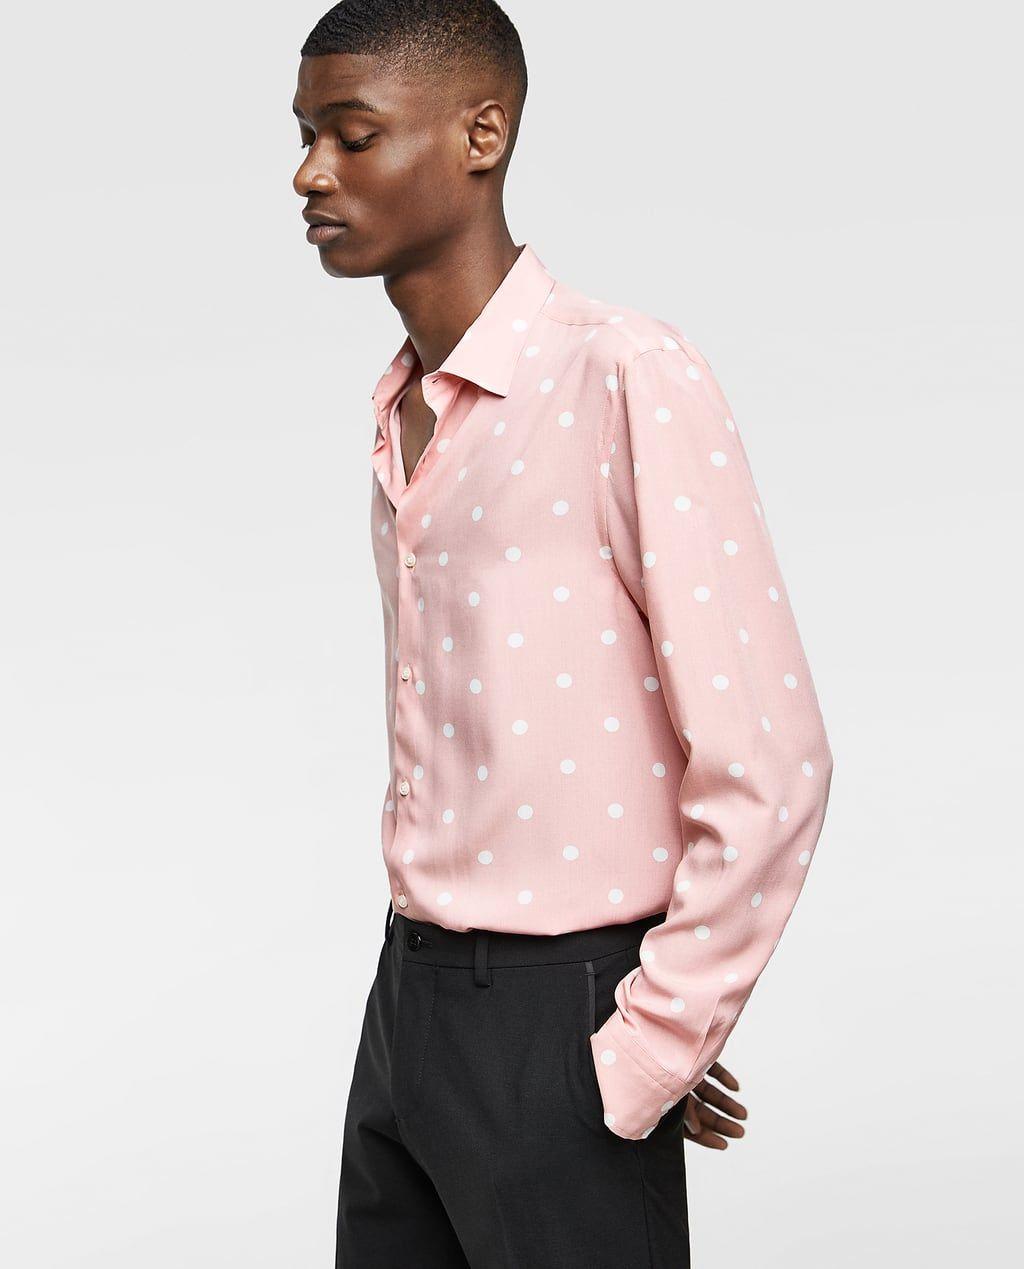 Imagen 2 De Camisa Estampada Lunares De Zara Polka Dot Shirt Shirts Floral Shirt